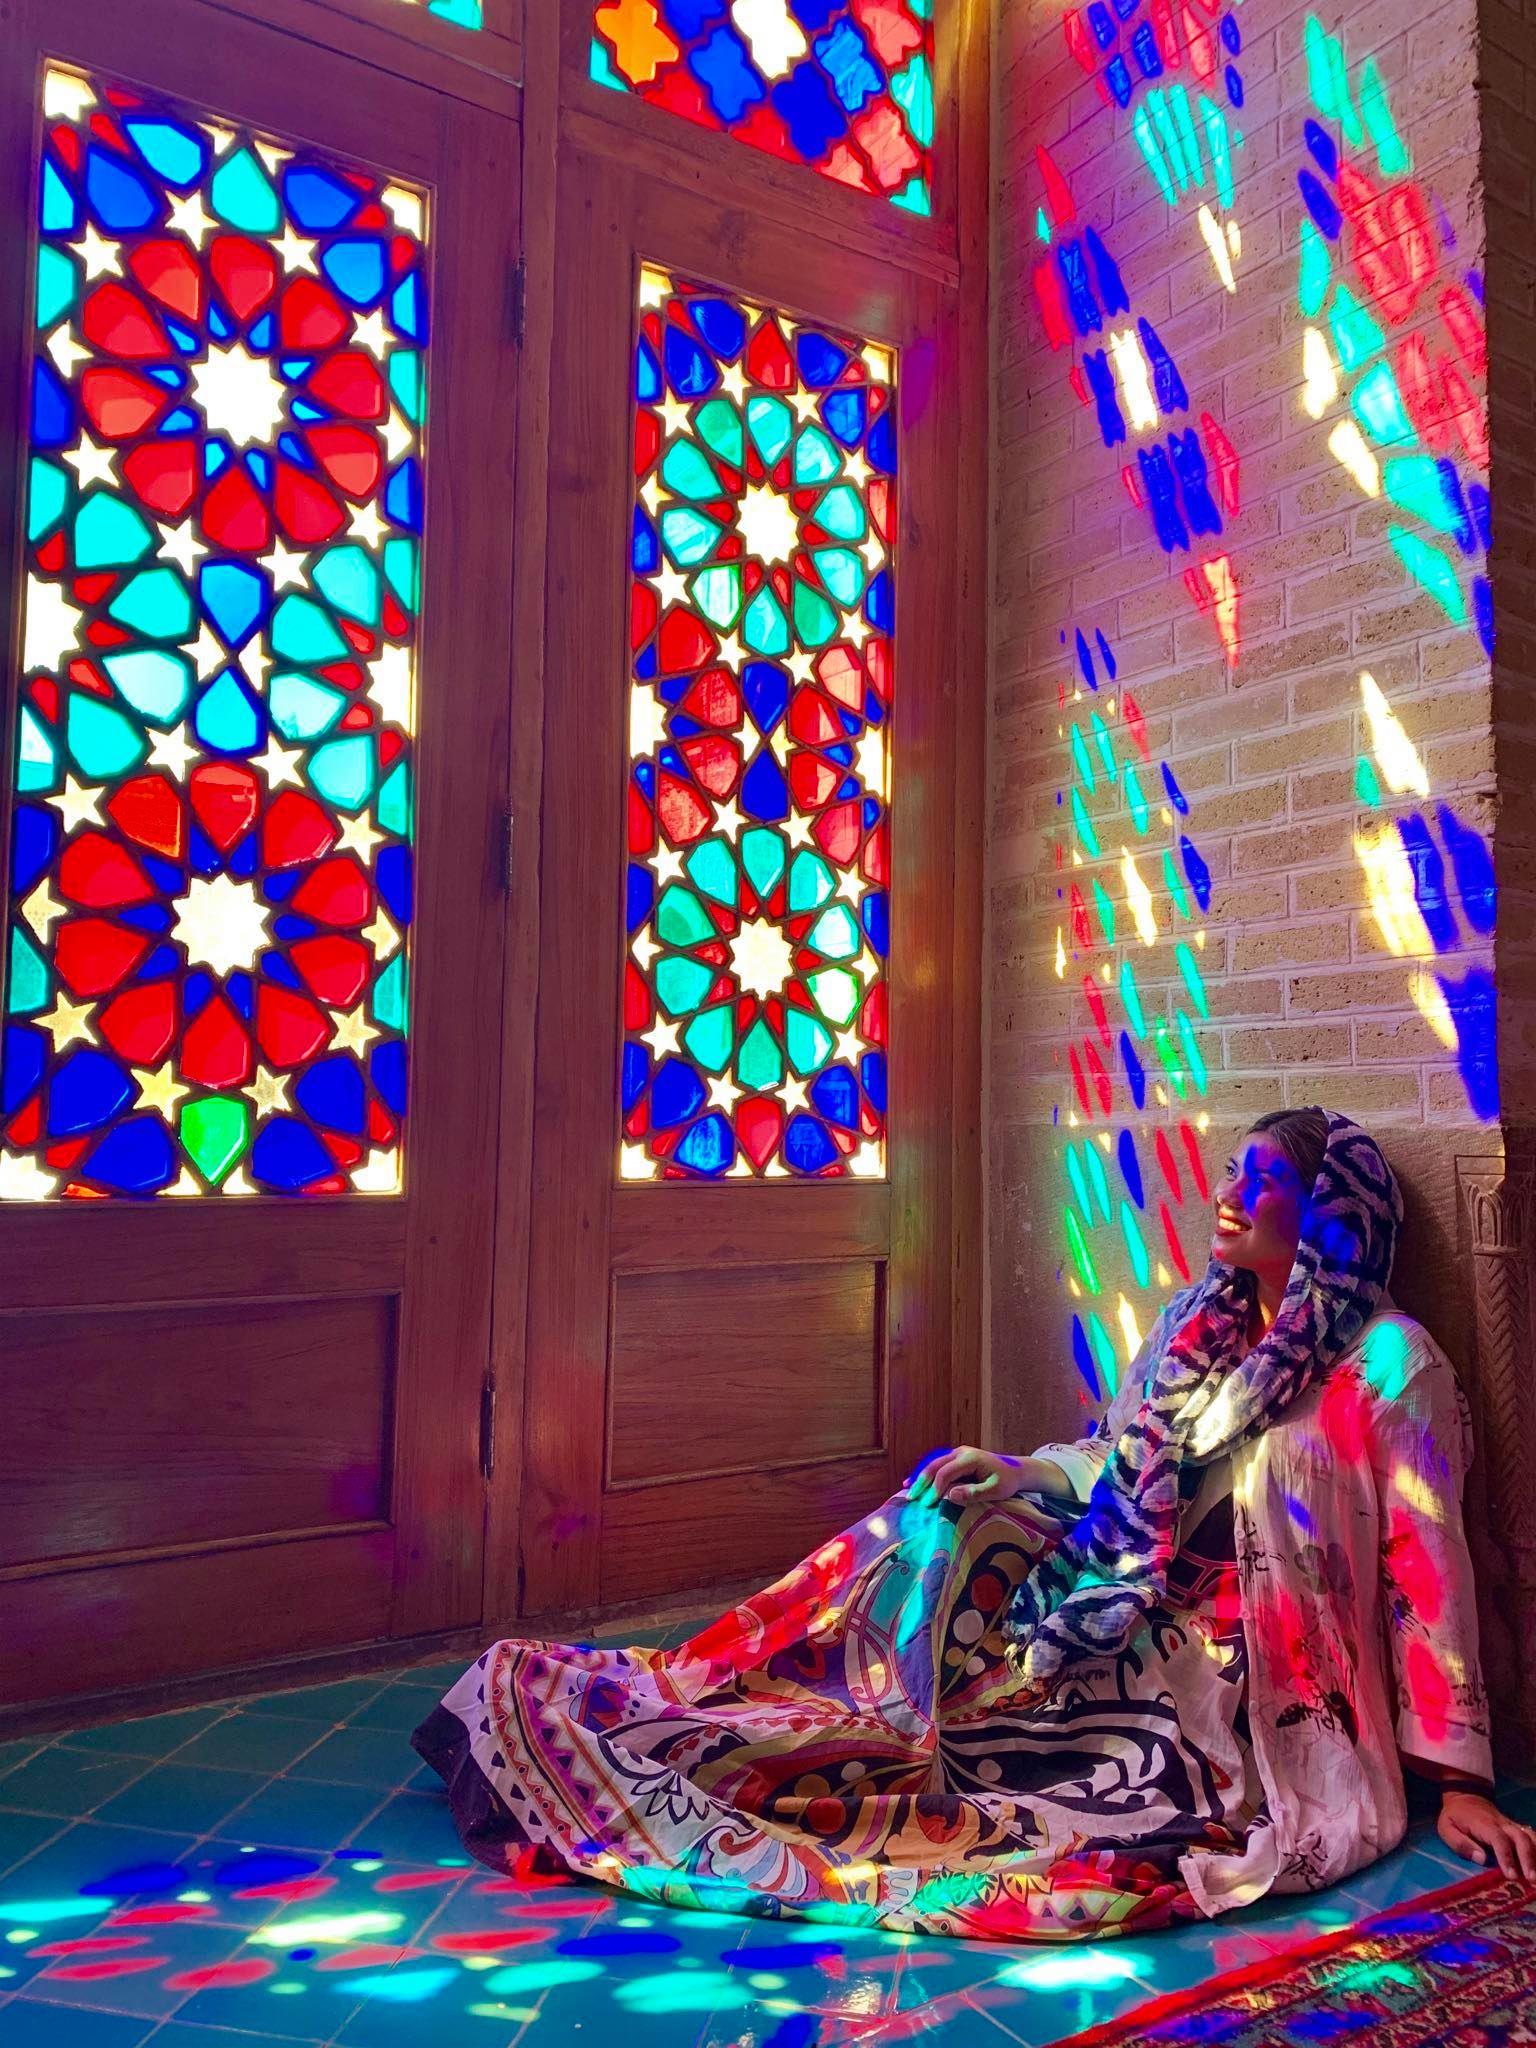 Kach Solo Travels in 2019 Good morning from SHIRAZ, IRAN4.jpg